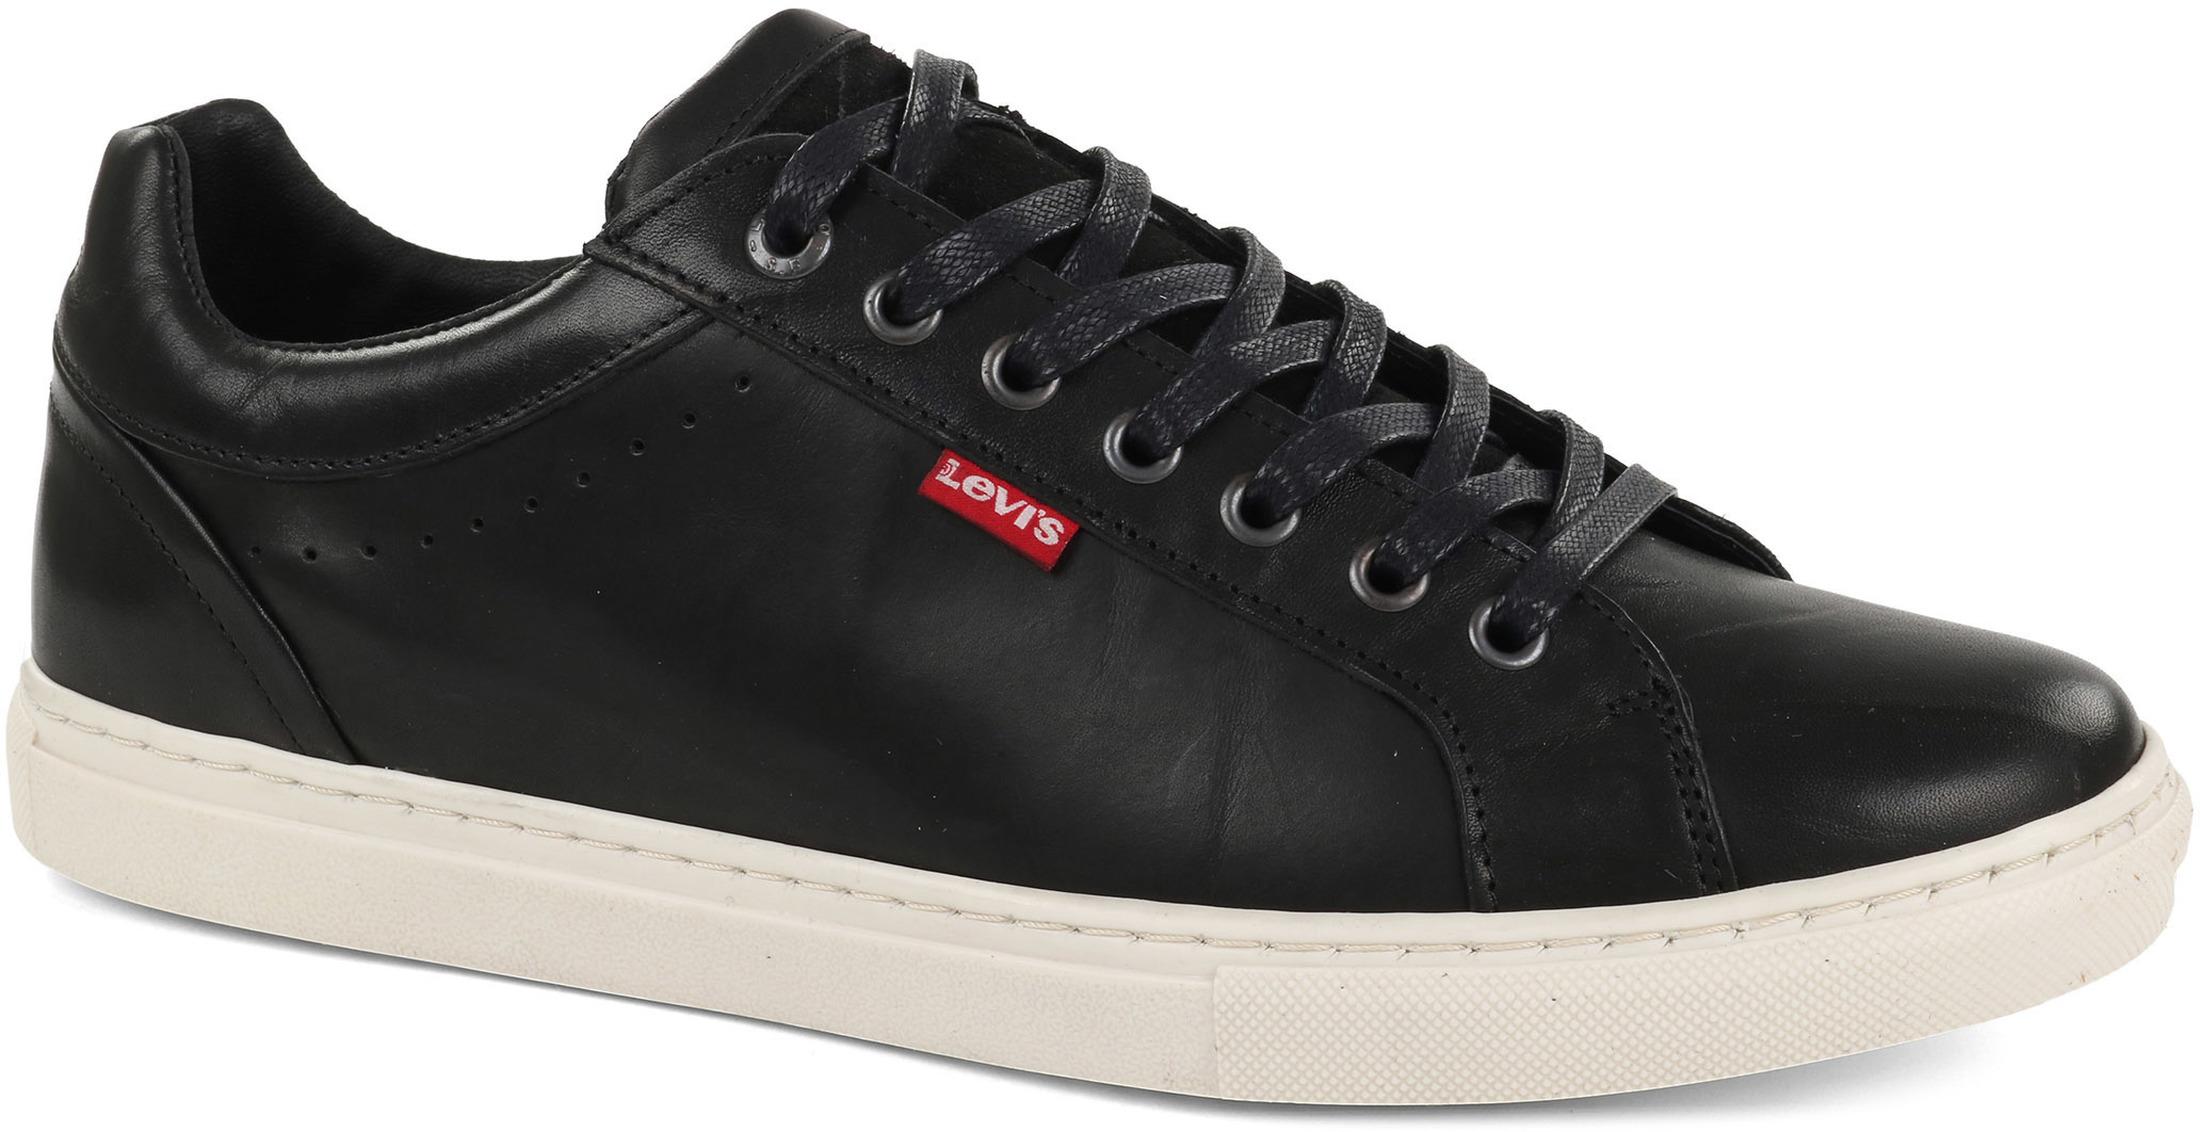 a844cfe1902967 Levi's Sneaker Perris Derby Schwarz 77127-4545 online kaufen   Suitable